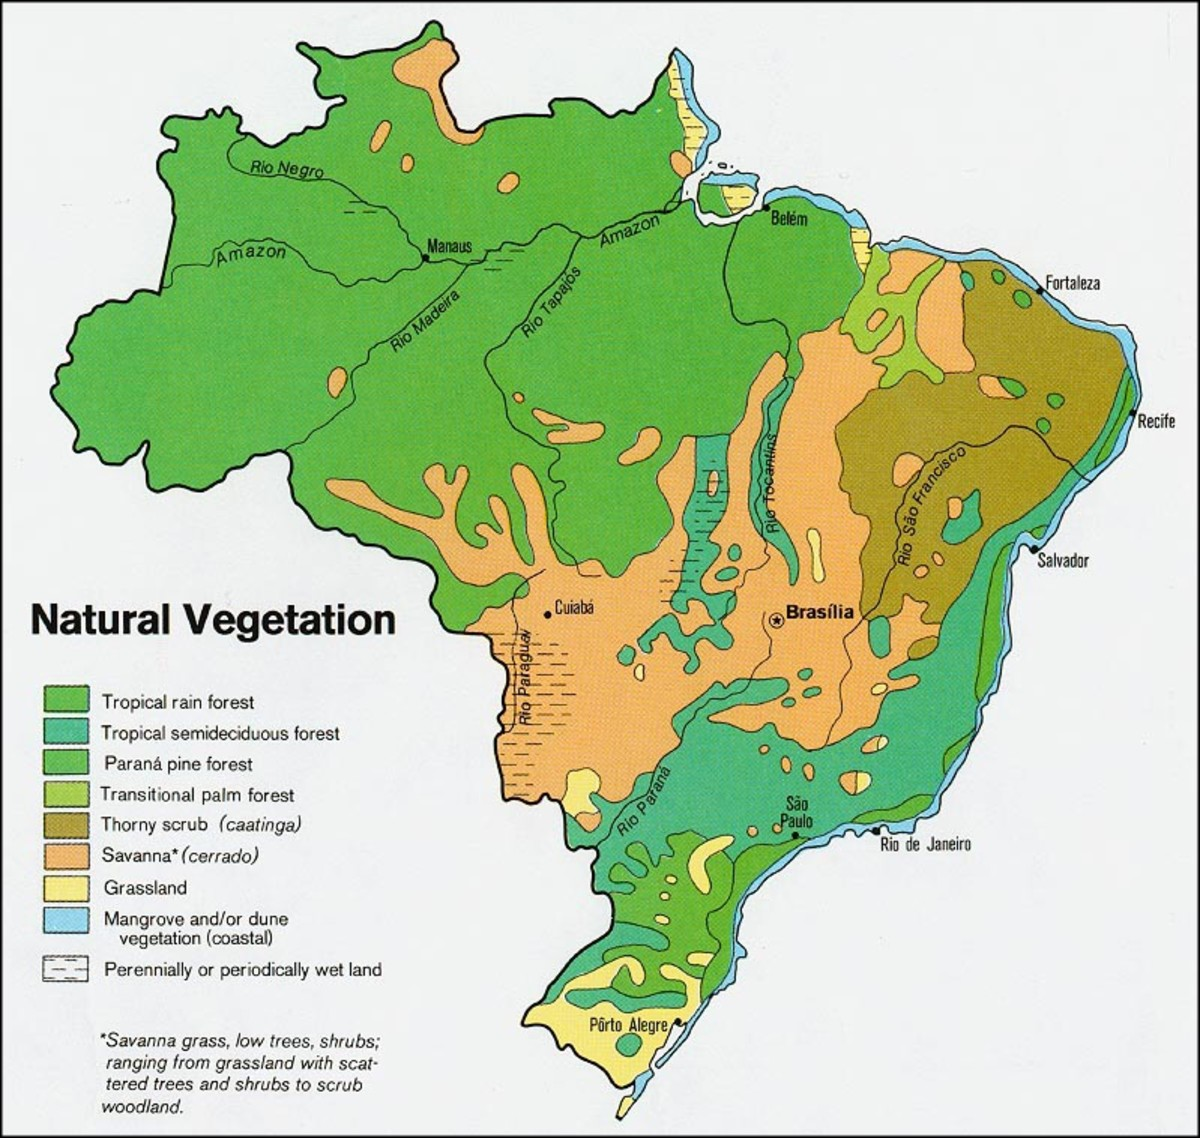 Vegetation in Brazil